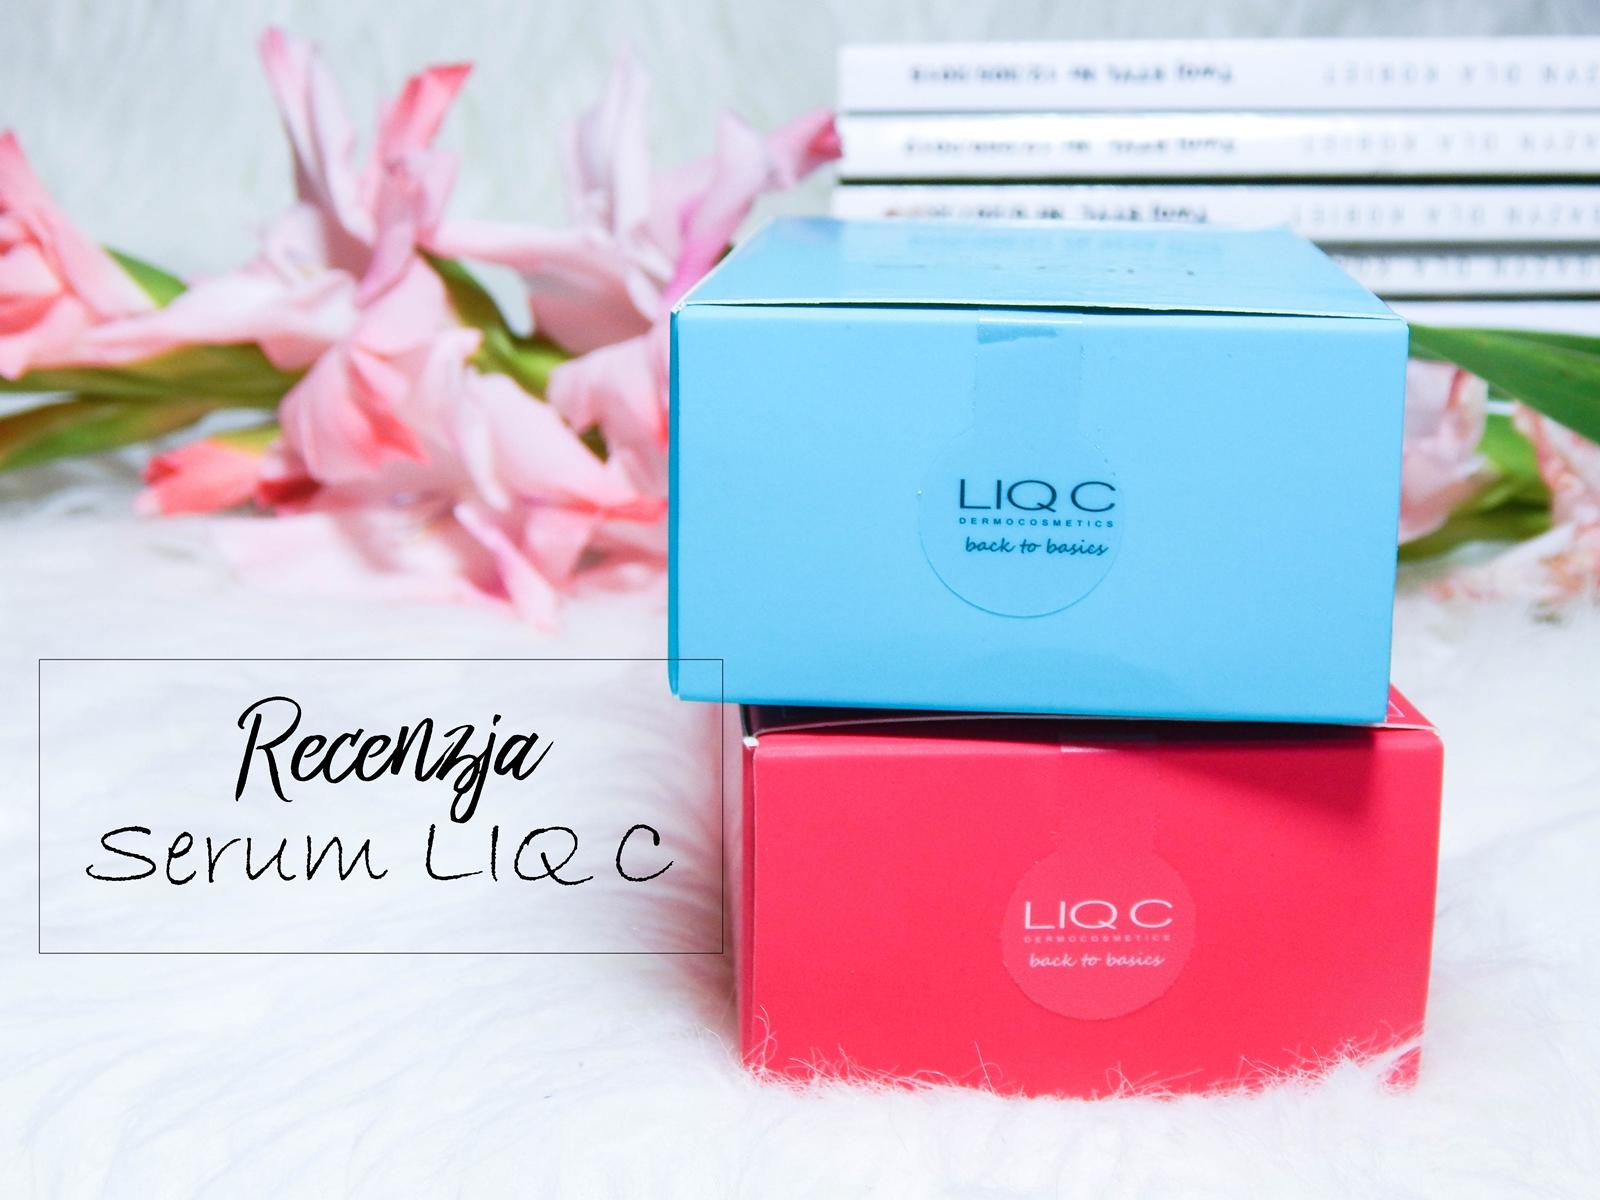 liq cc serum z witamina c opinie lig c 15